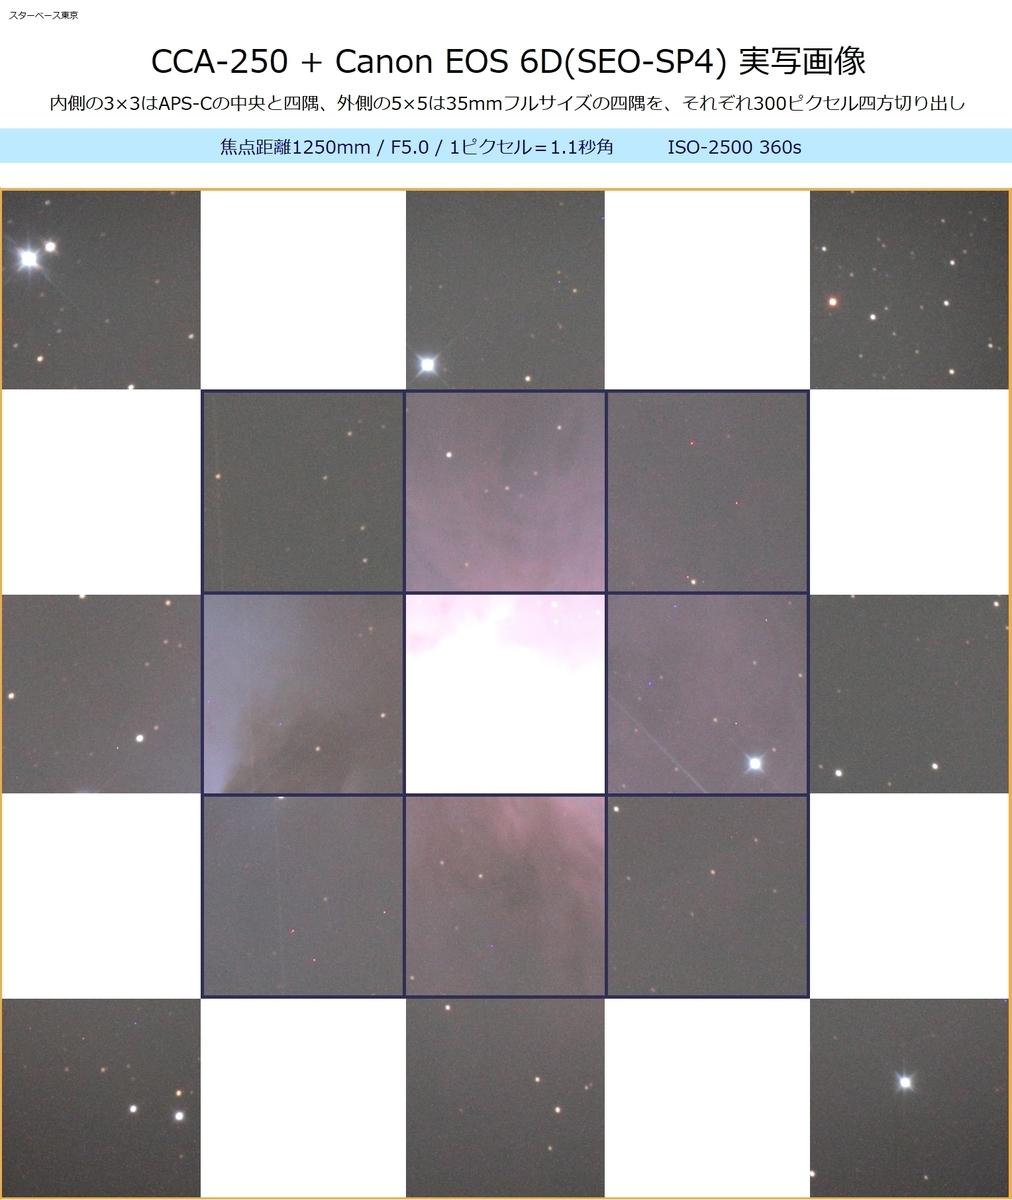 f:id:starbase:20201022212932j:plain